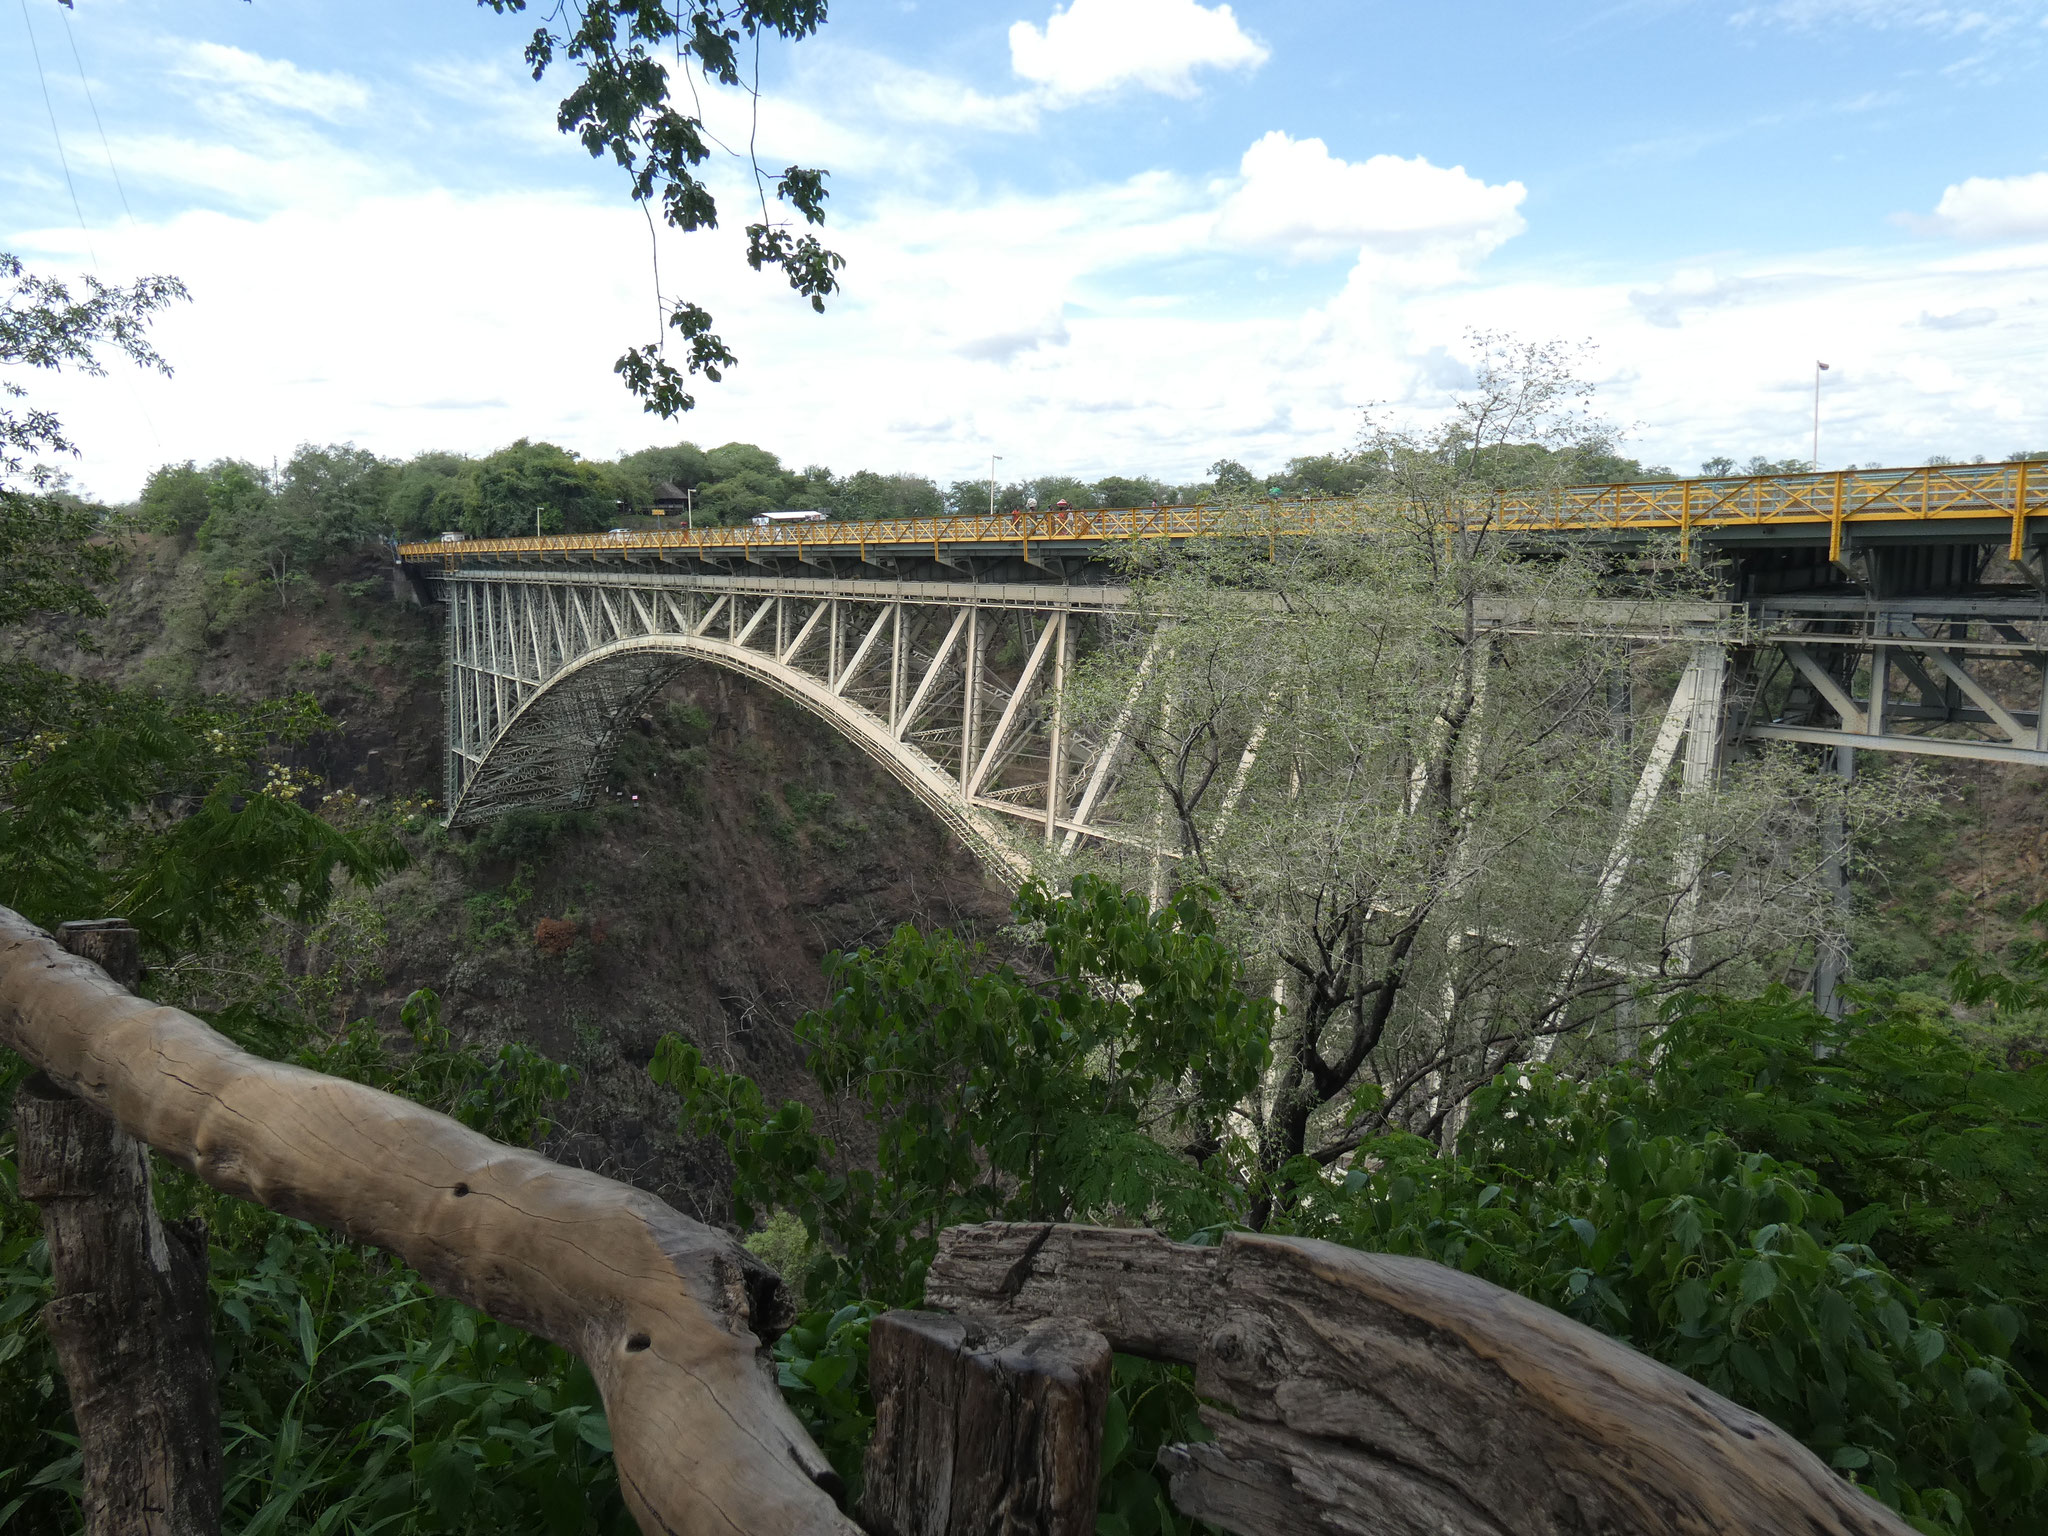 Brücke von Simbabwe nach Sambia